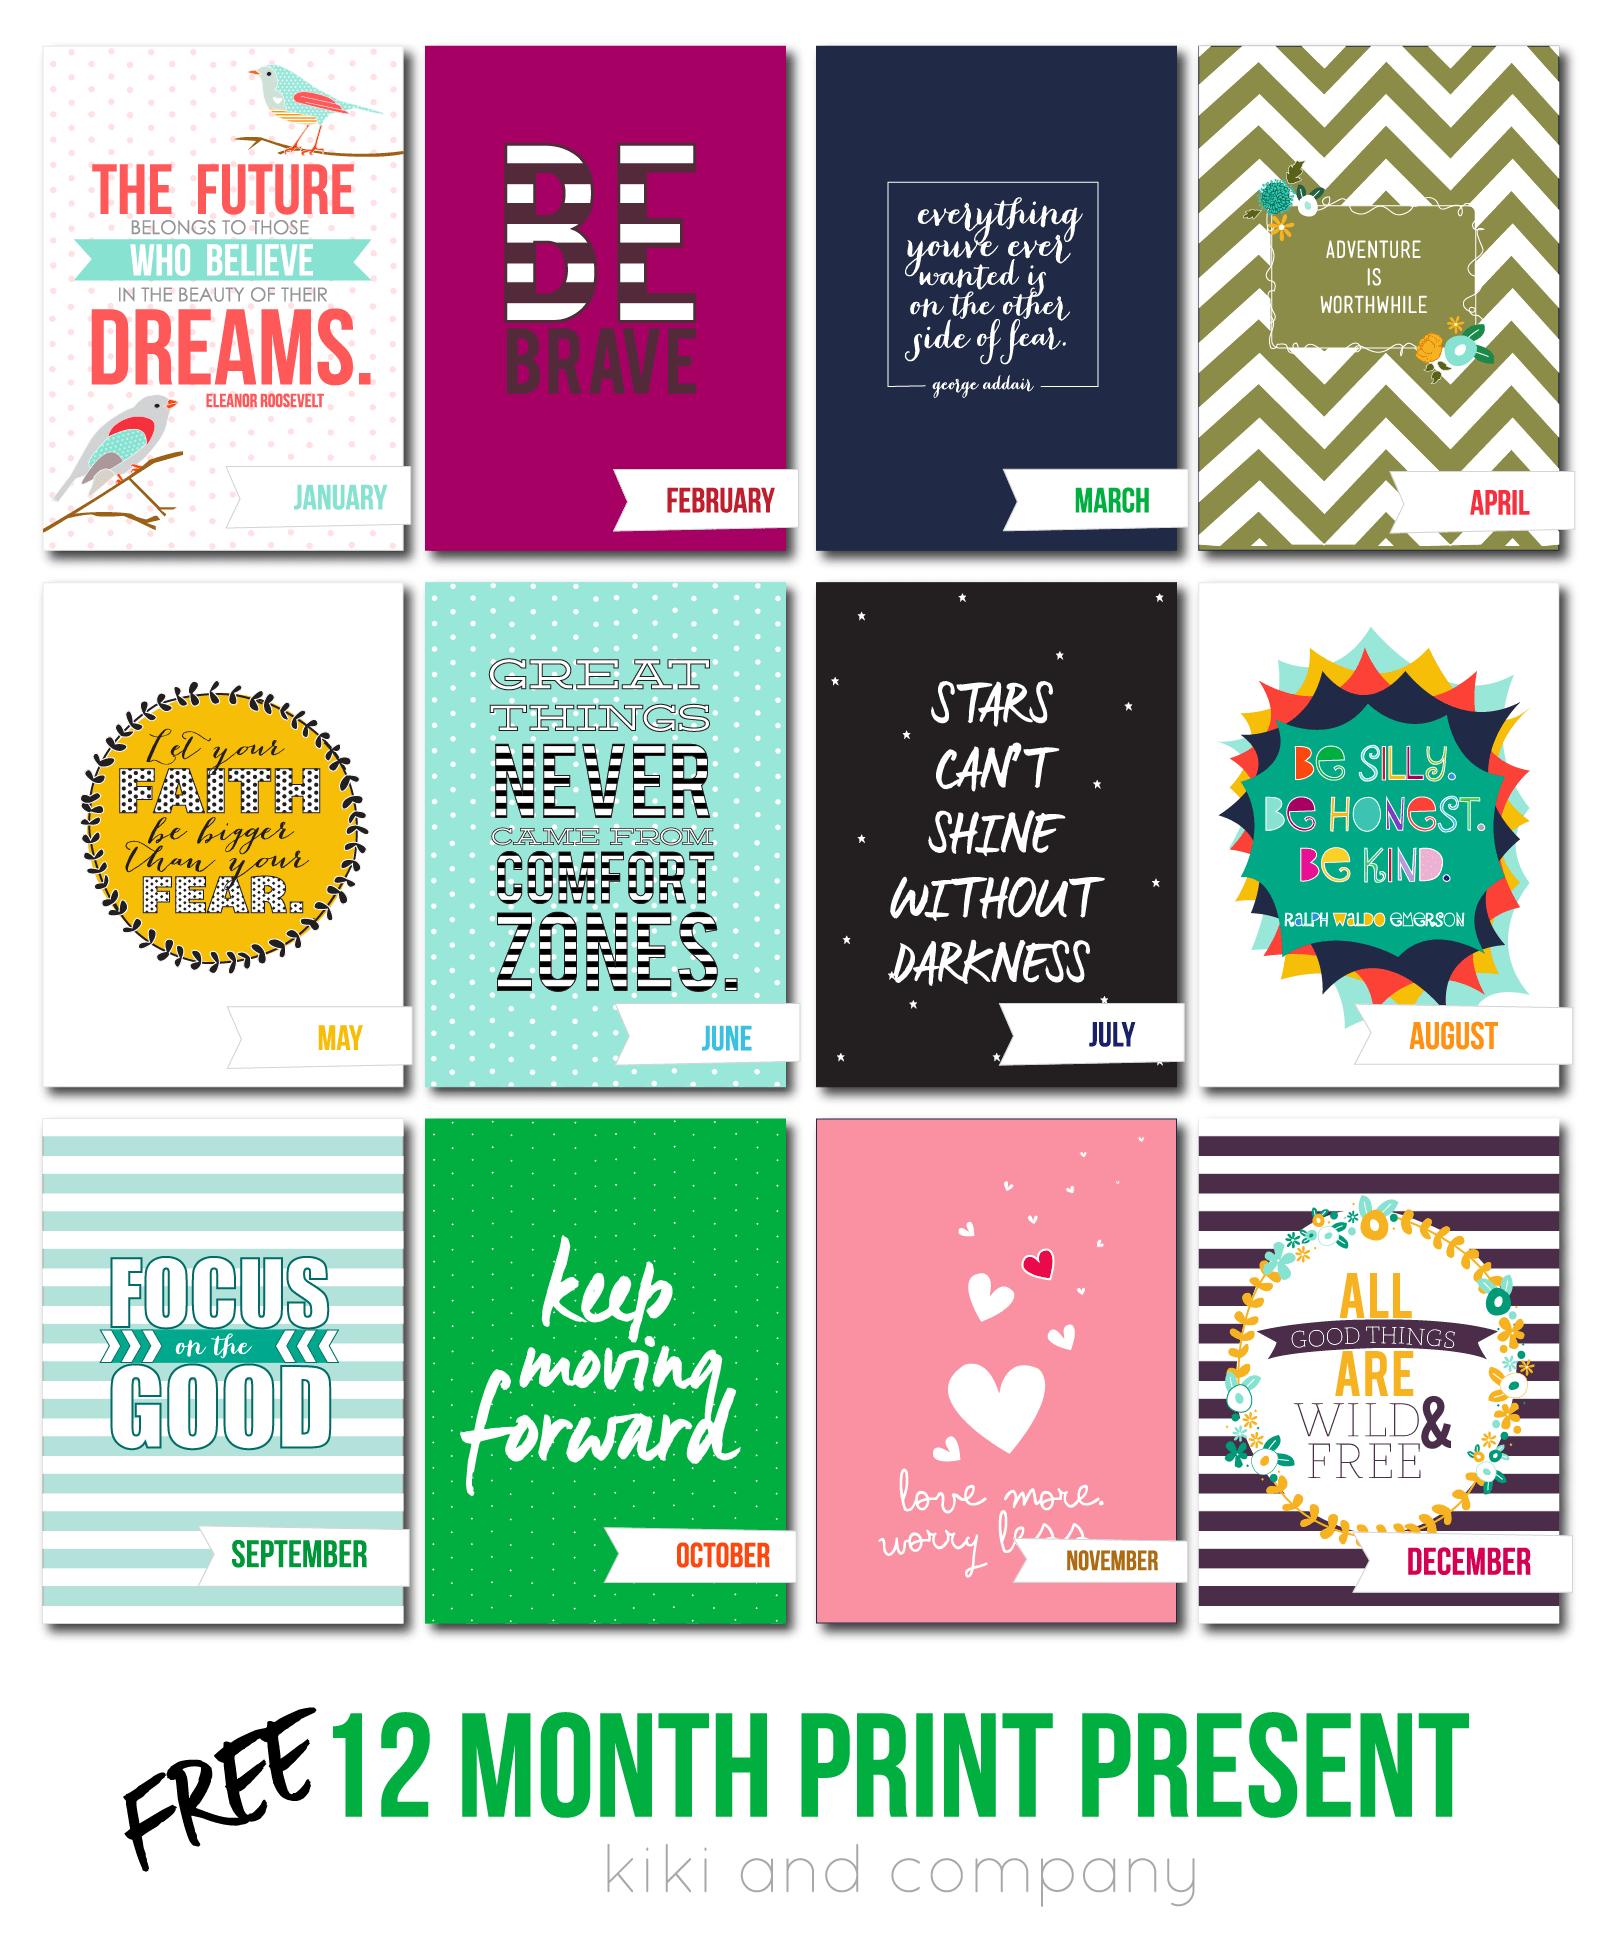 12 Month Print Christmas Present Free Printables